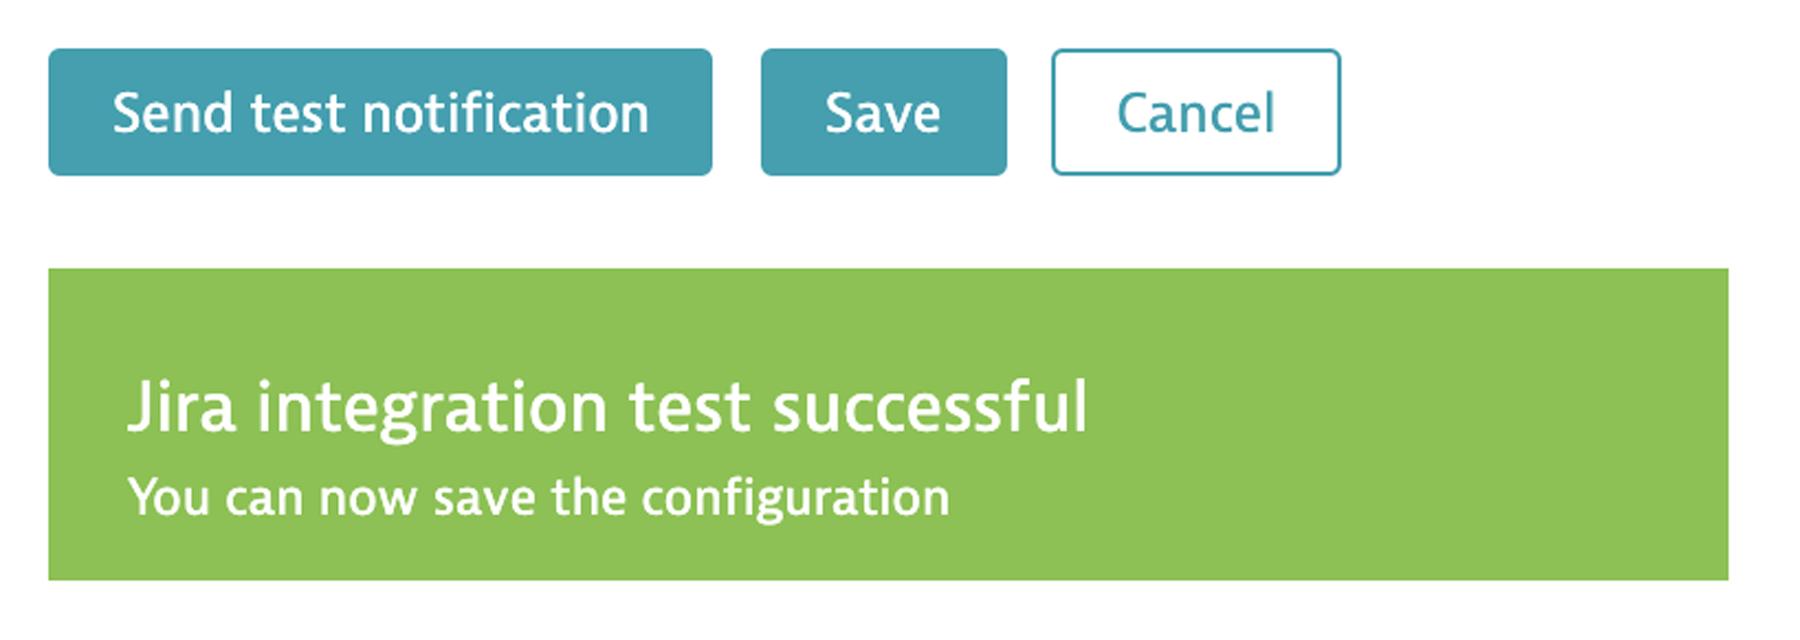 Jira integration test successful